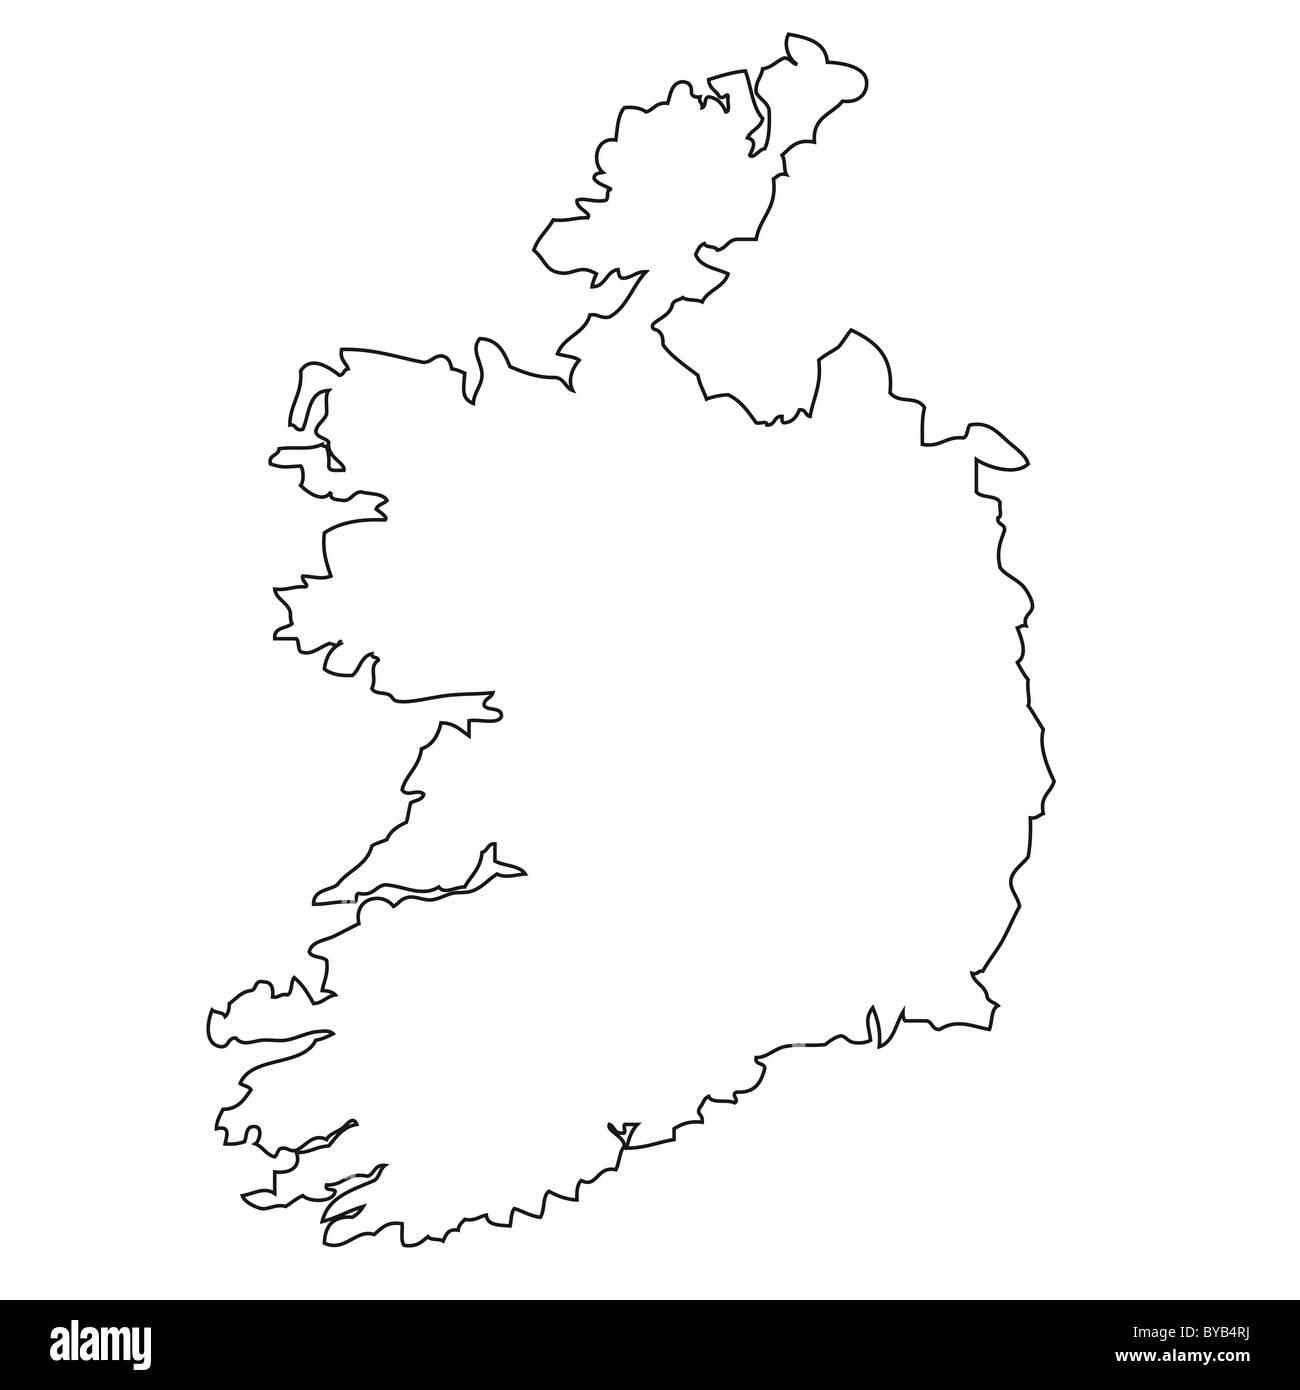 Outline Map Of Ireland.Outline Map Of Ireland Stock Photo 34051350 Alamy